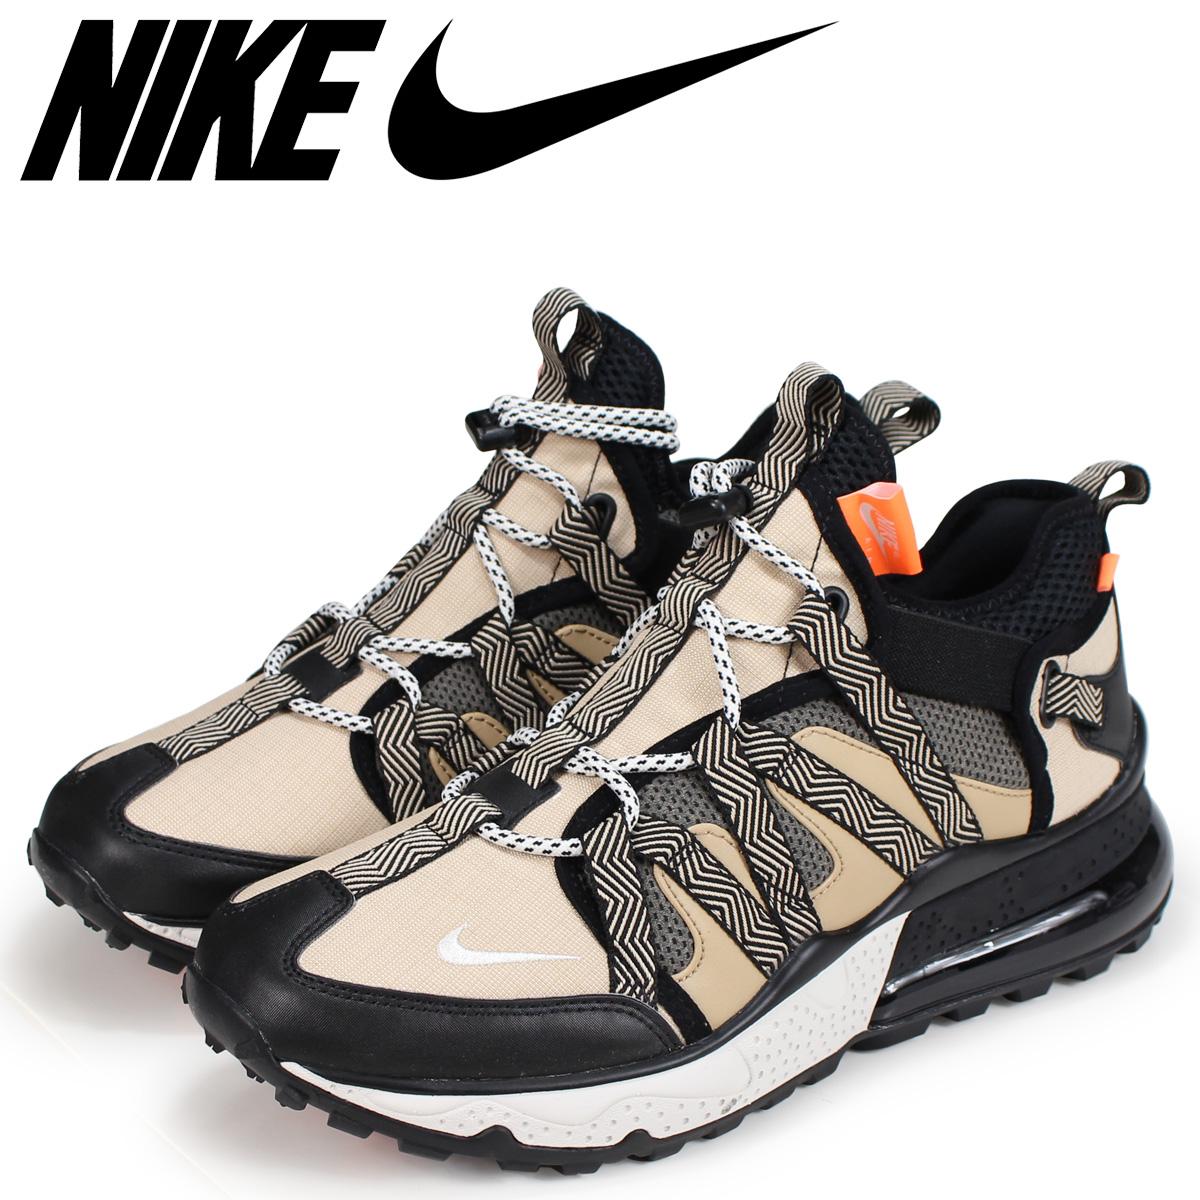 Shop Nike Mens Air Max 270 Black Online | Platypus Shoes